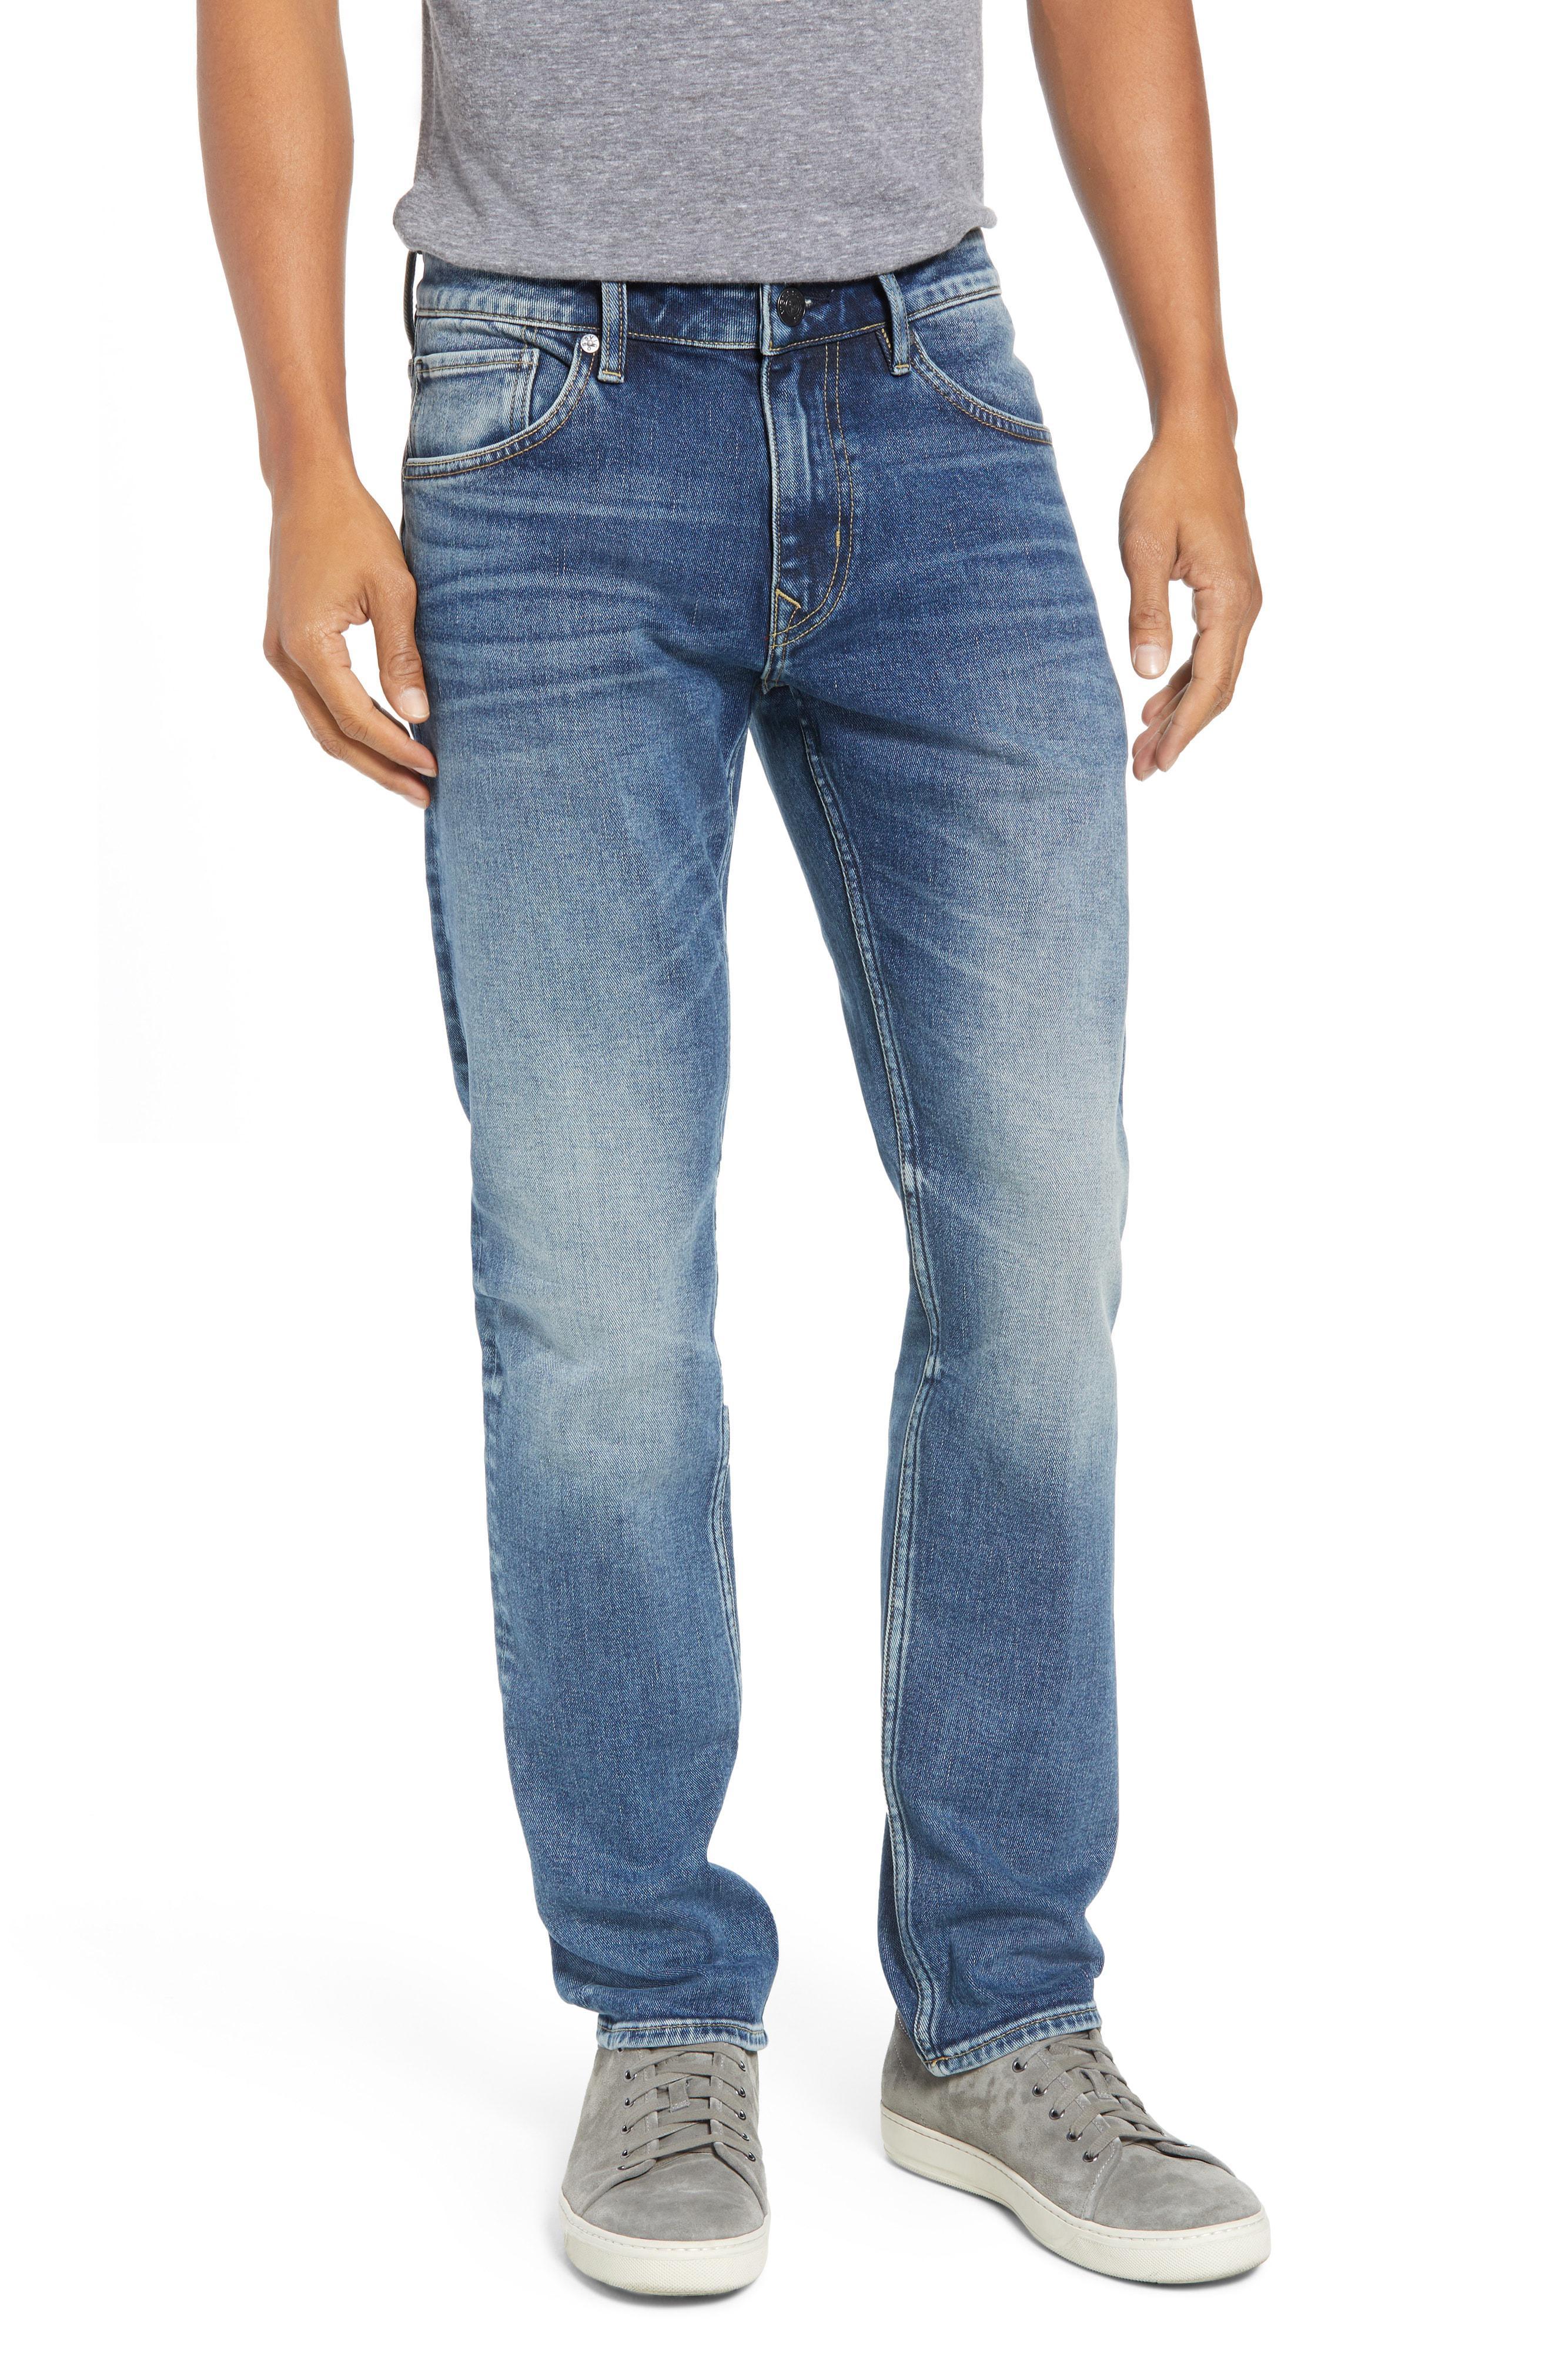 bcc58333c52 Lyst - Vigoss Mick Slim Fit Jeans in Blue for Men